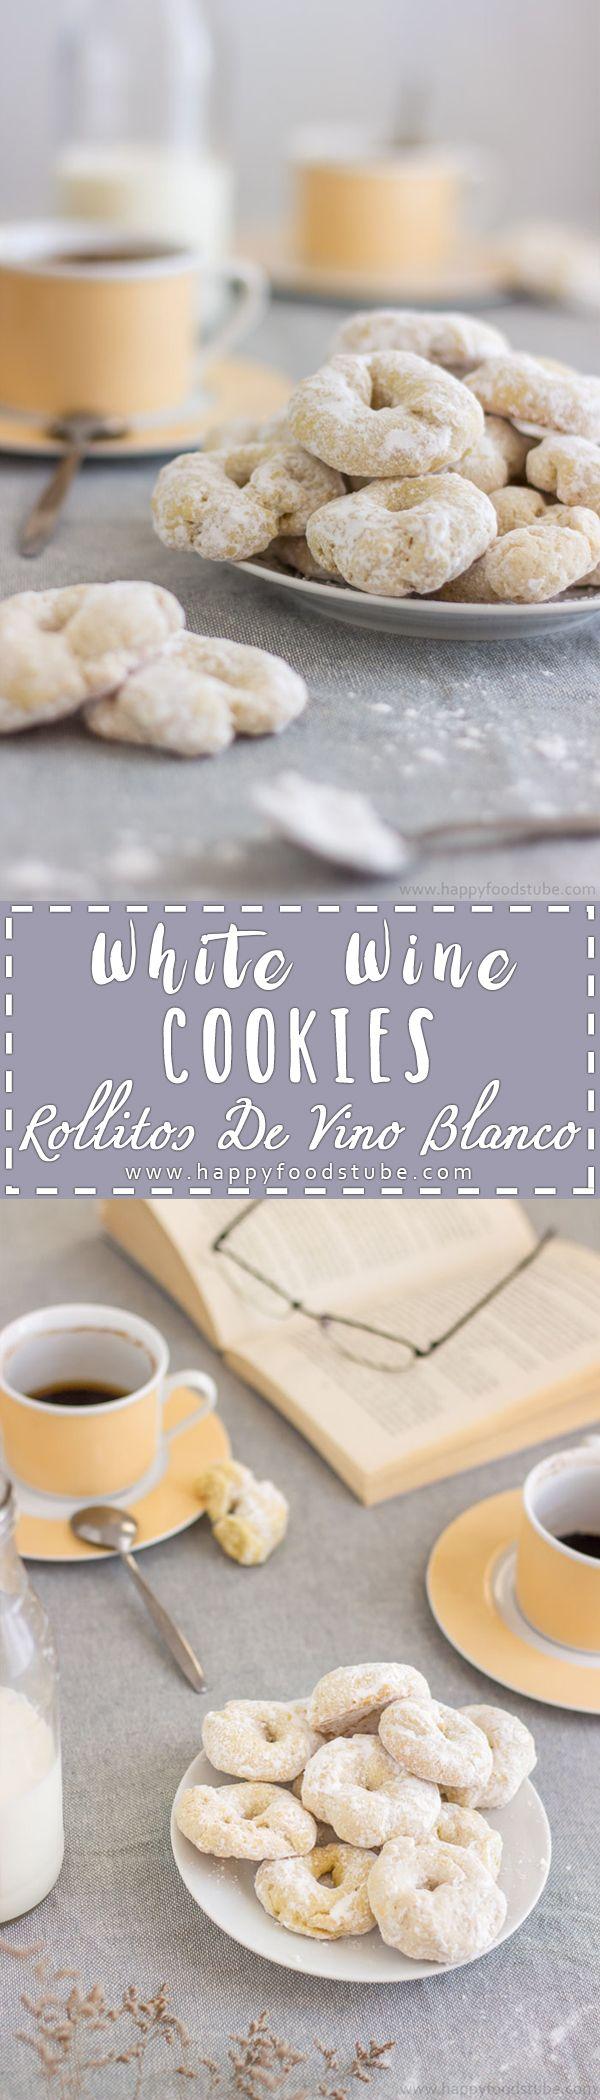 White Wine Cookies - Rollitos de Vino Blanco are delicious sweet treats! Homemade Spanish dessert recipe | happyfoodstube.com